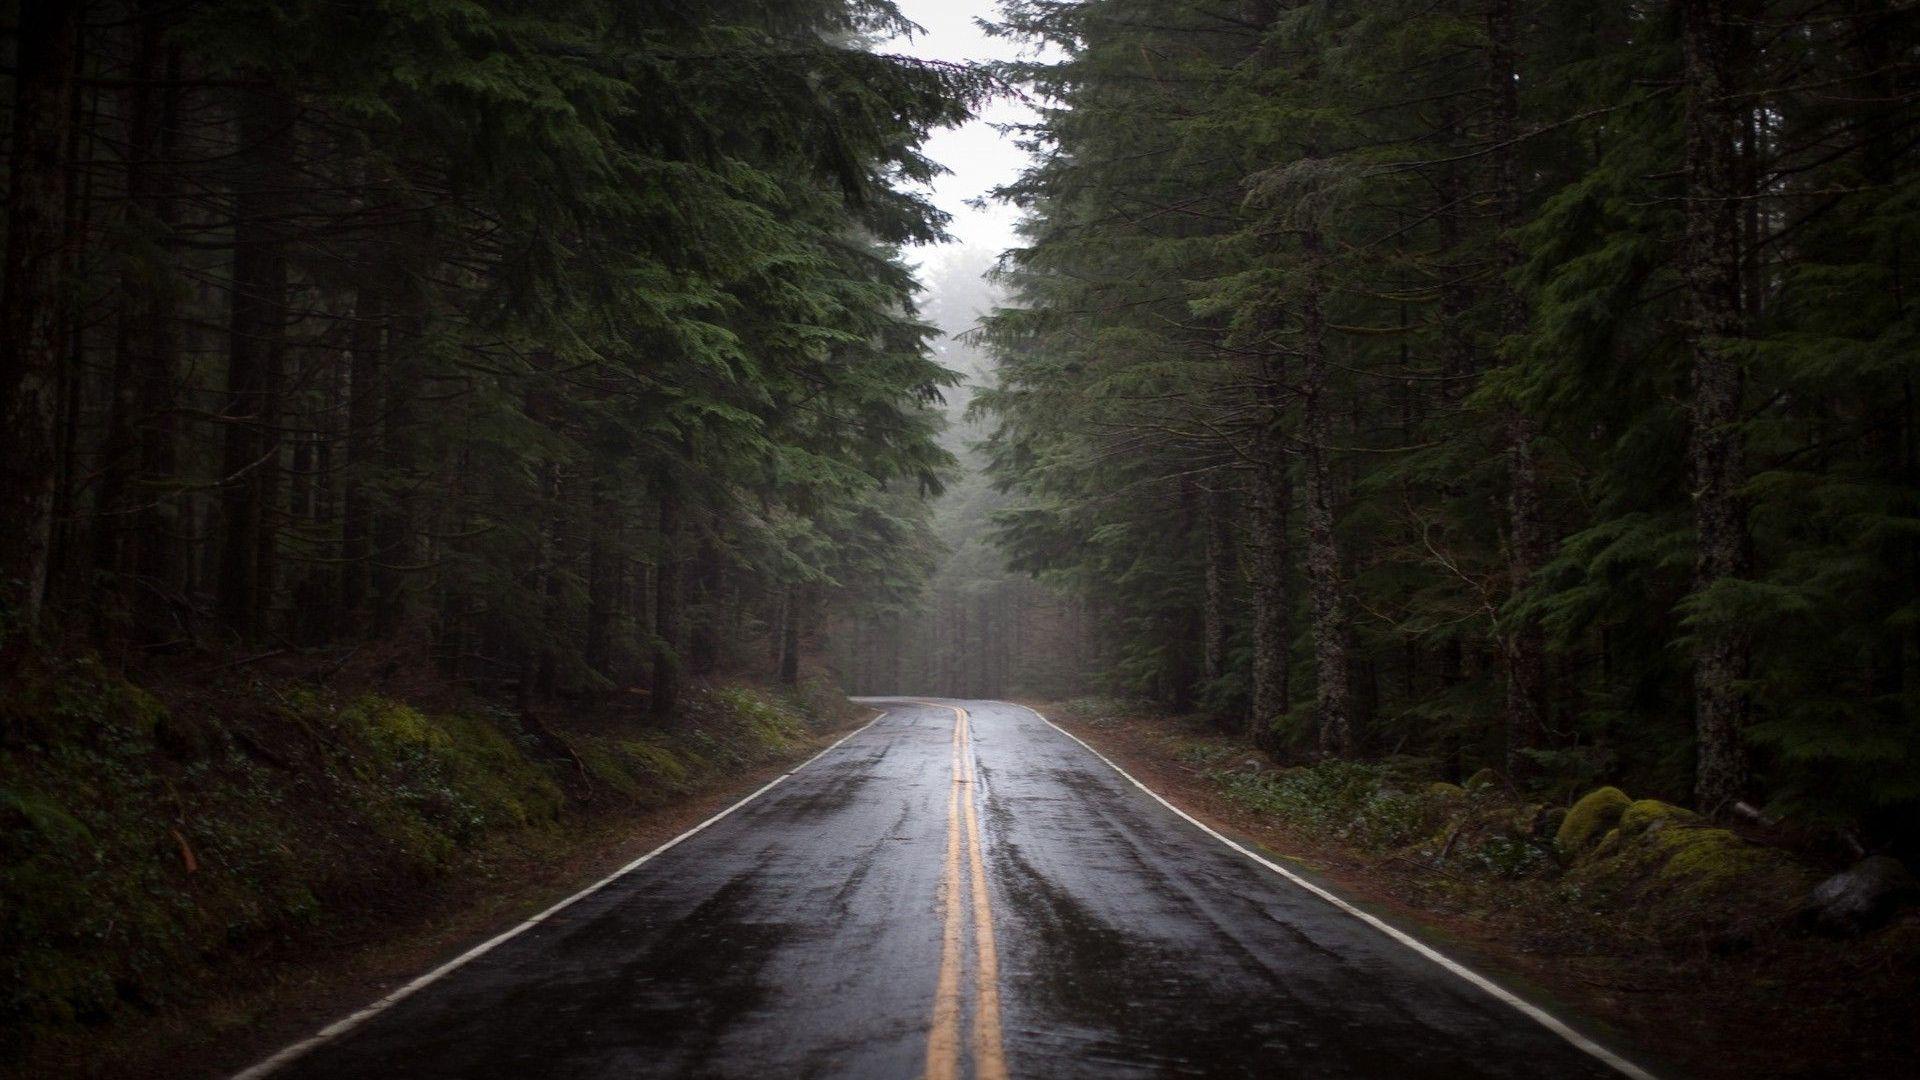 Rainy Forest Wallpaper - WallpaperSafari